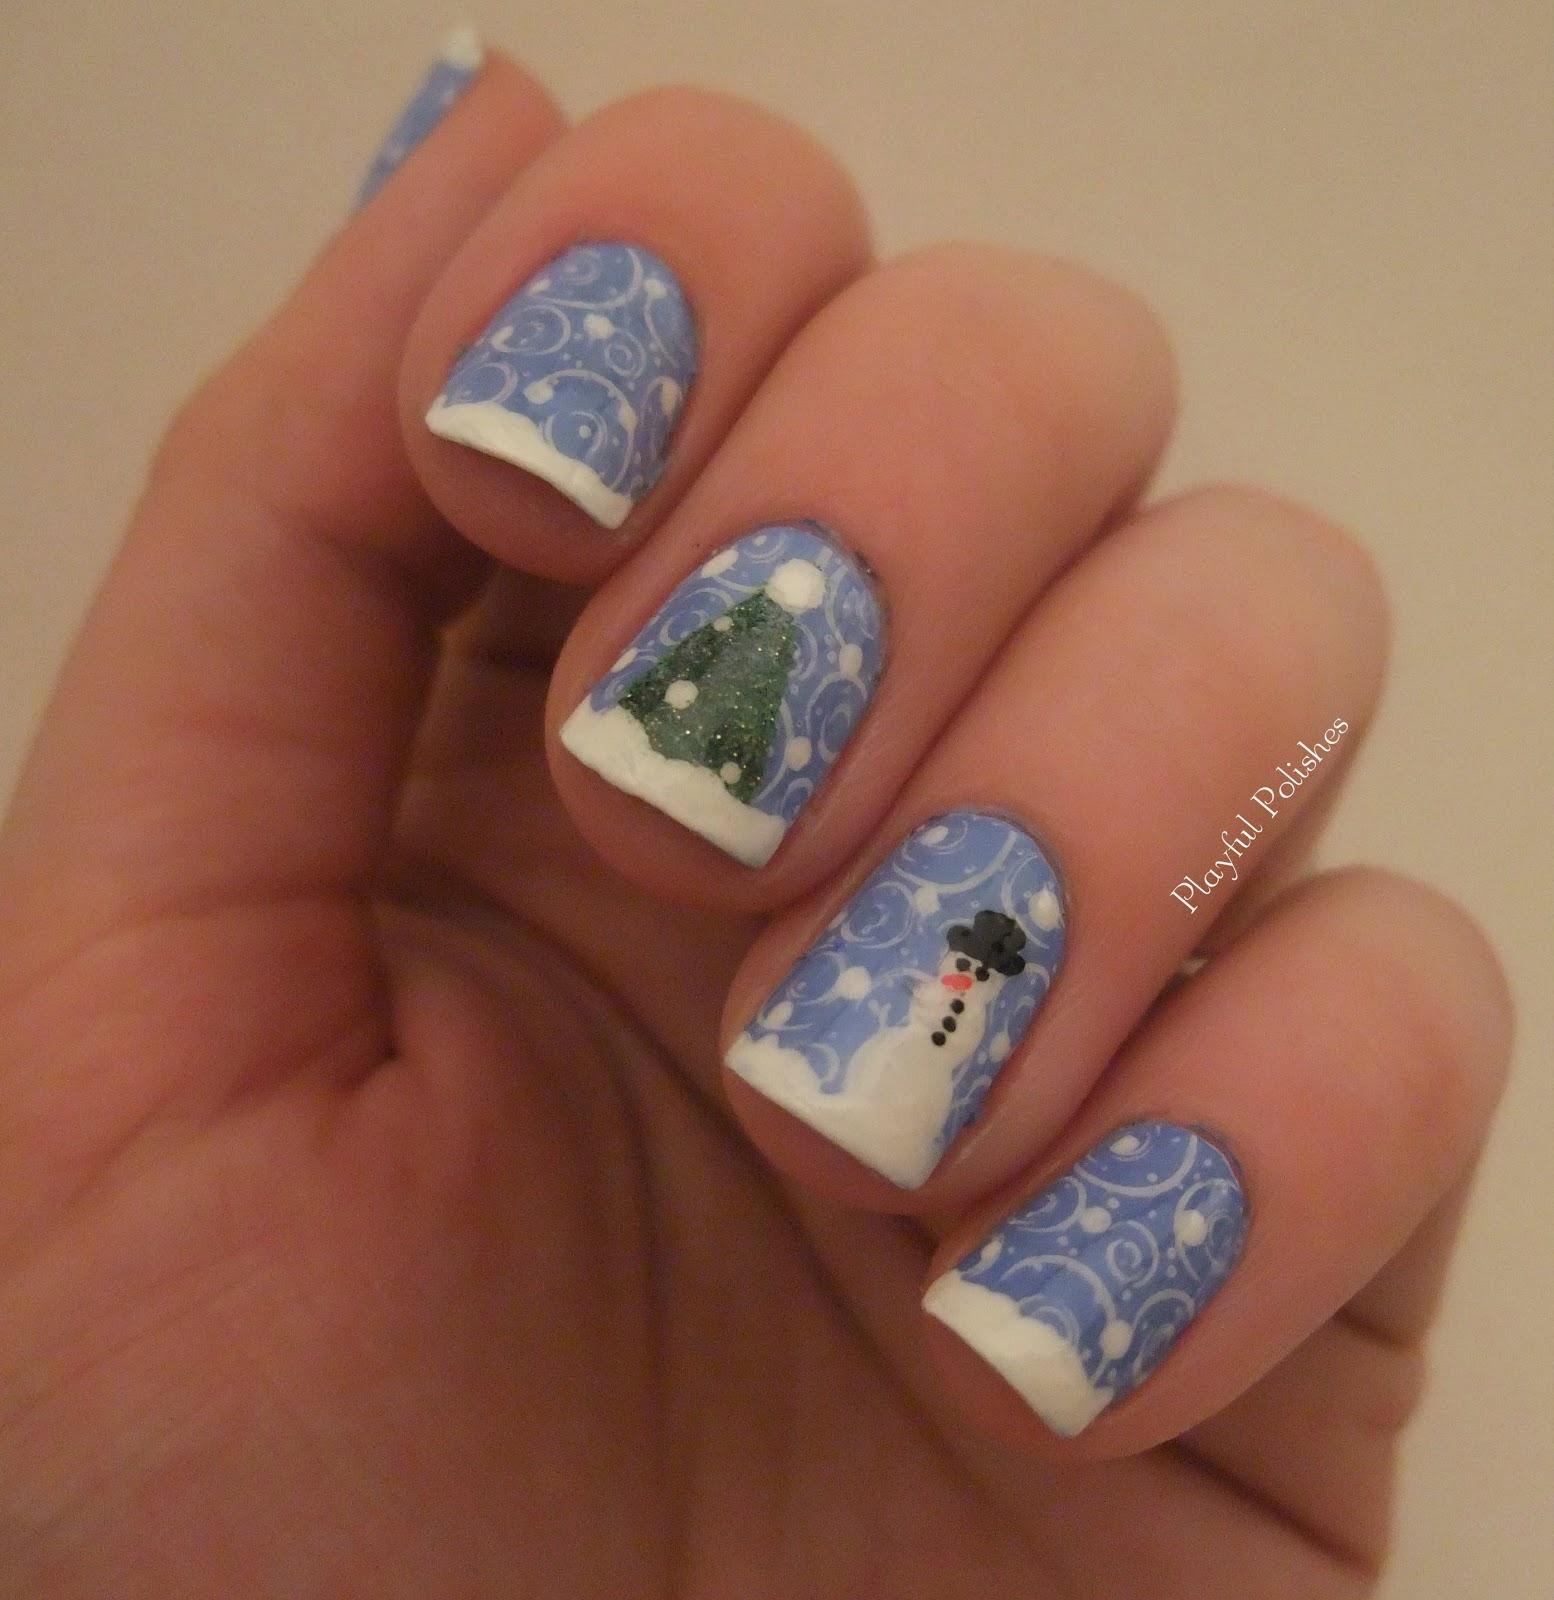 Winter Fingernail Designs: Nail Designs That Take You To A Winter Wonderland